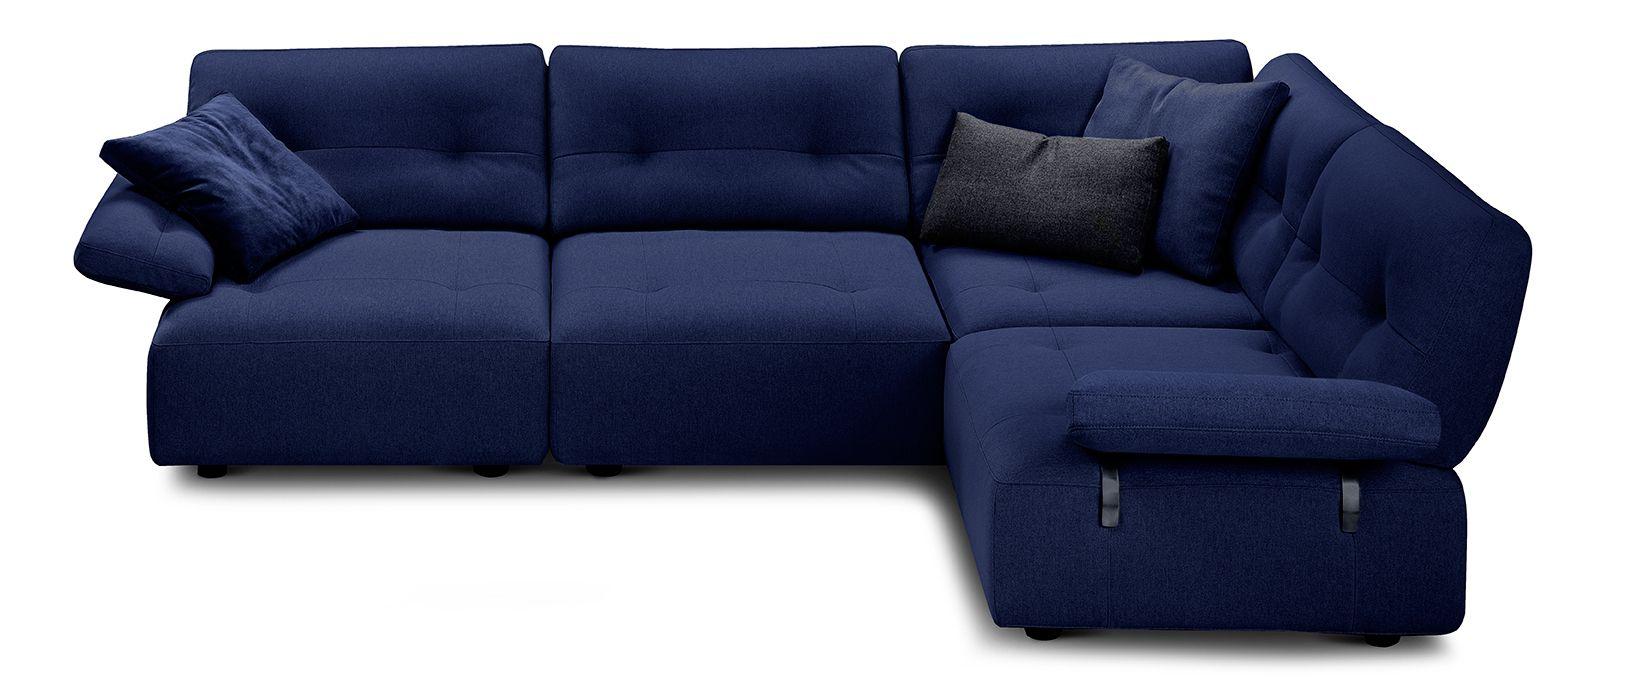 King Furniture Houdini Steel Frame Modular Sofa Bed King